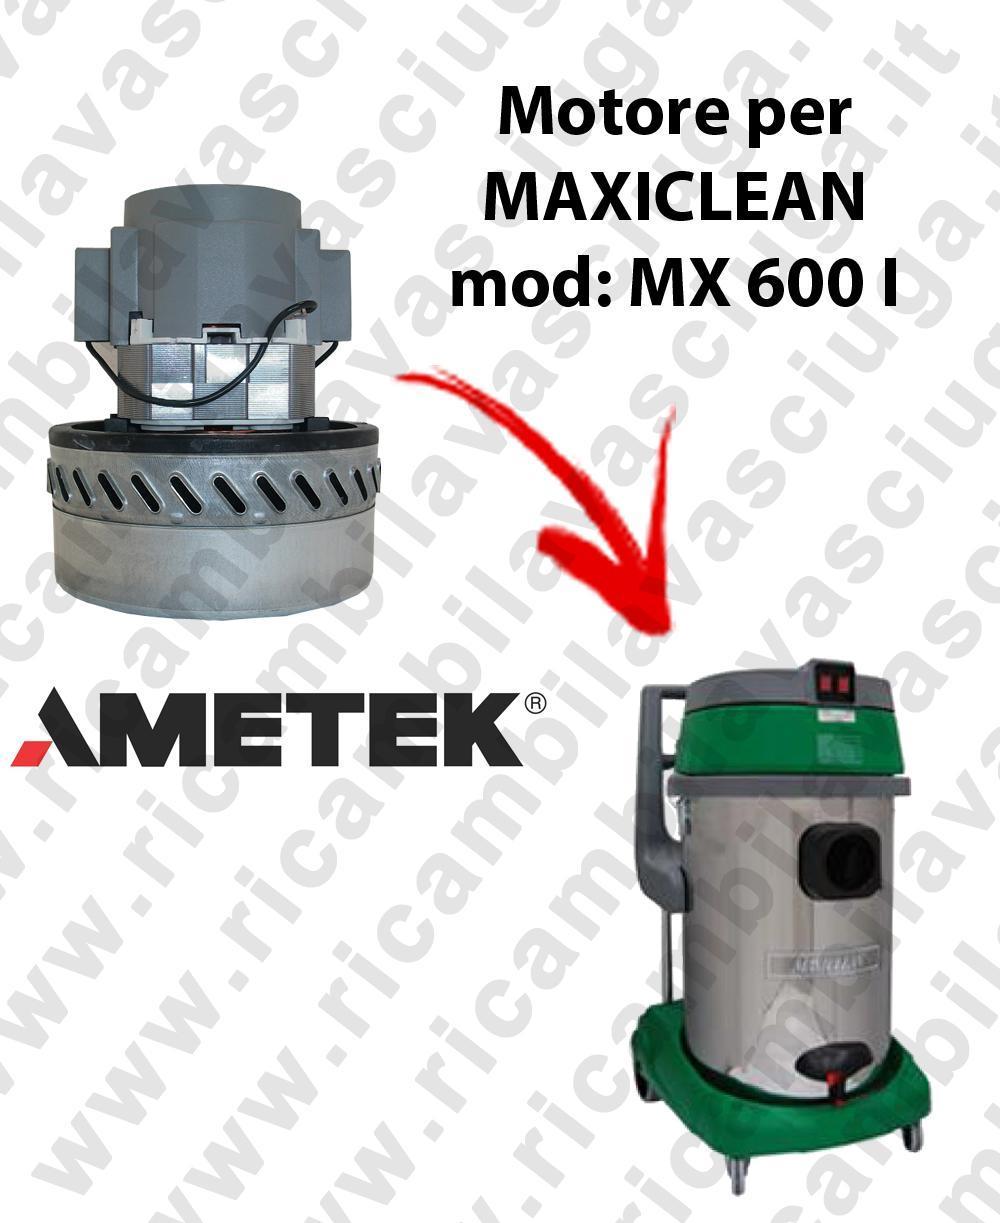 MX 600 I AMETEK vacuum motor for wet and dry vacuum cleaner MAXICLEAN